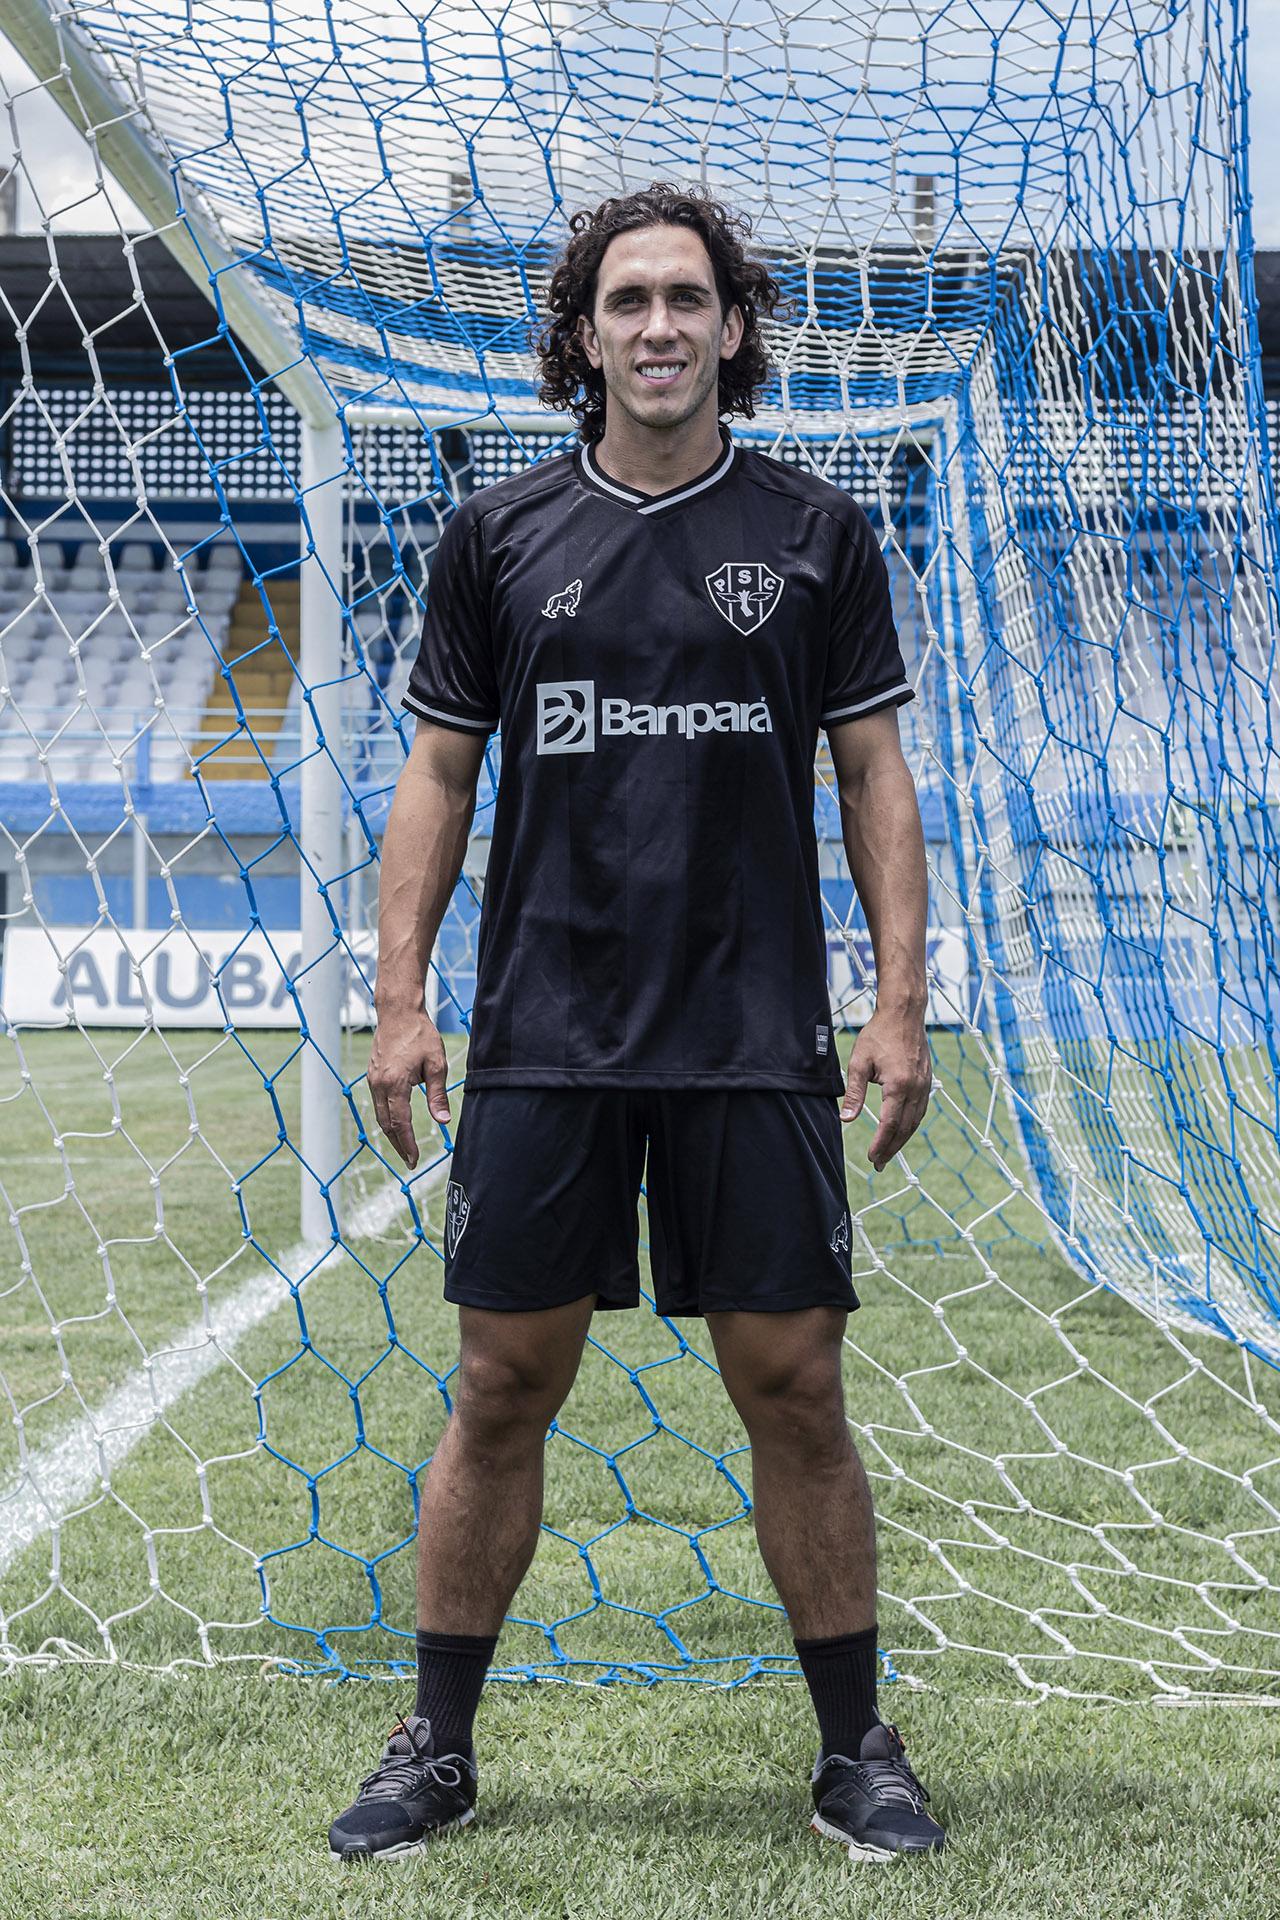 Negra 1914: Terceira camisa do Paysandu 2020-2021 Lobo